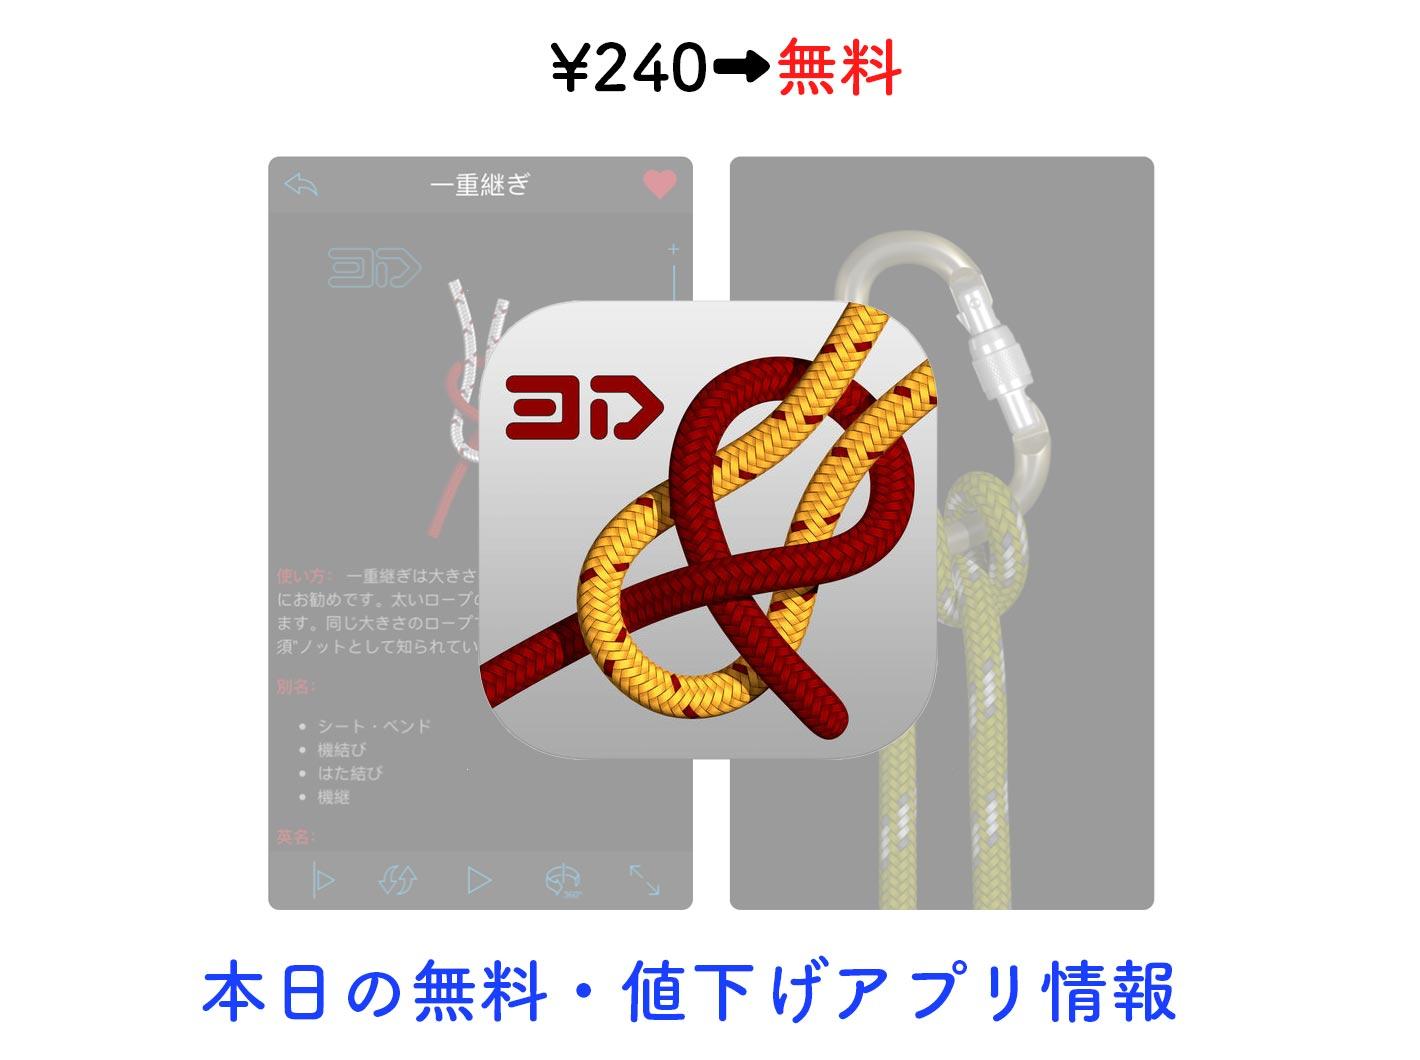 Appsale0709